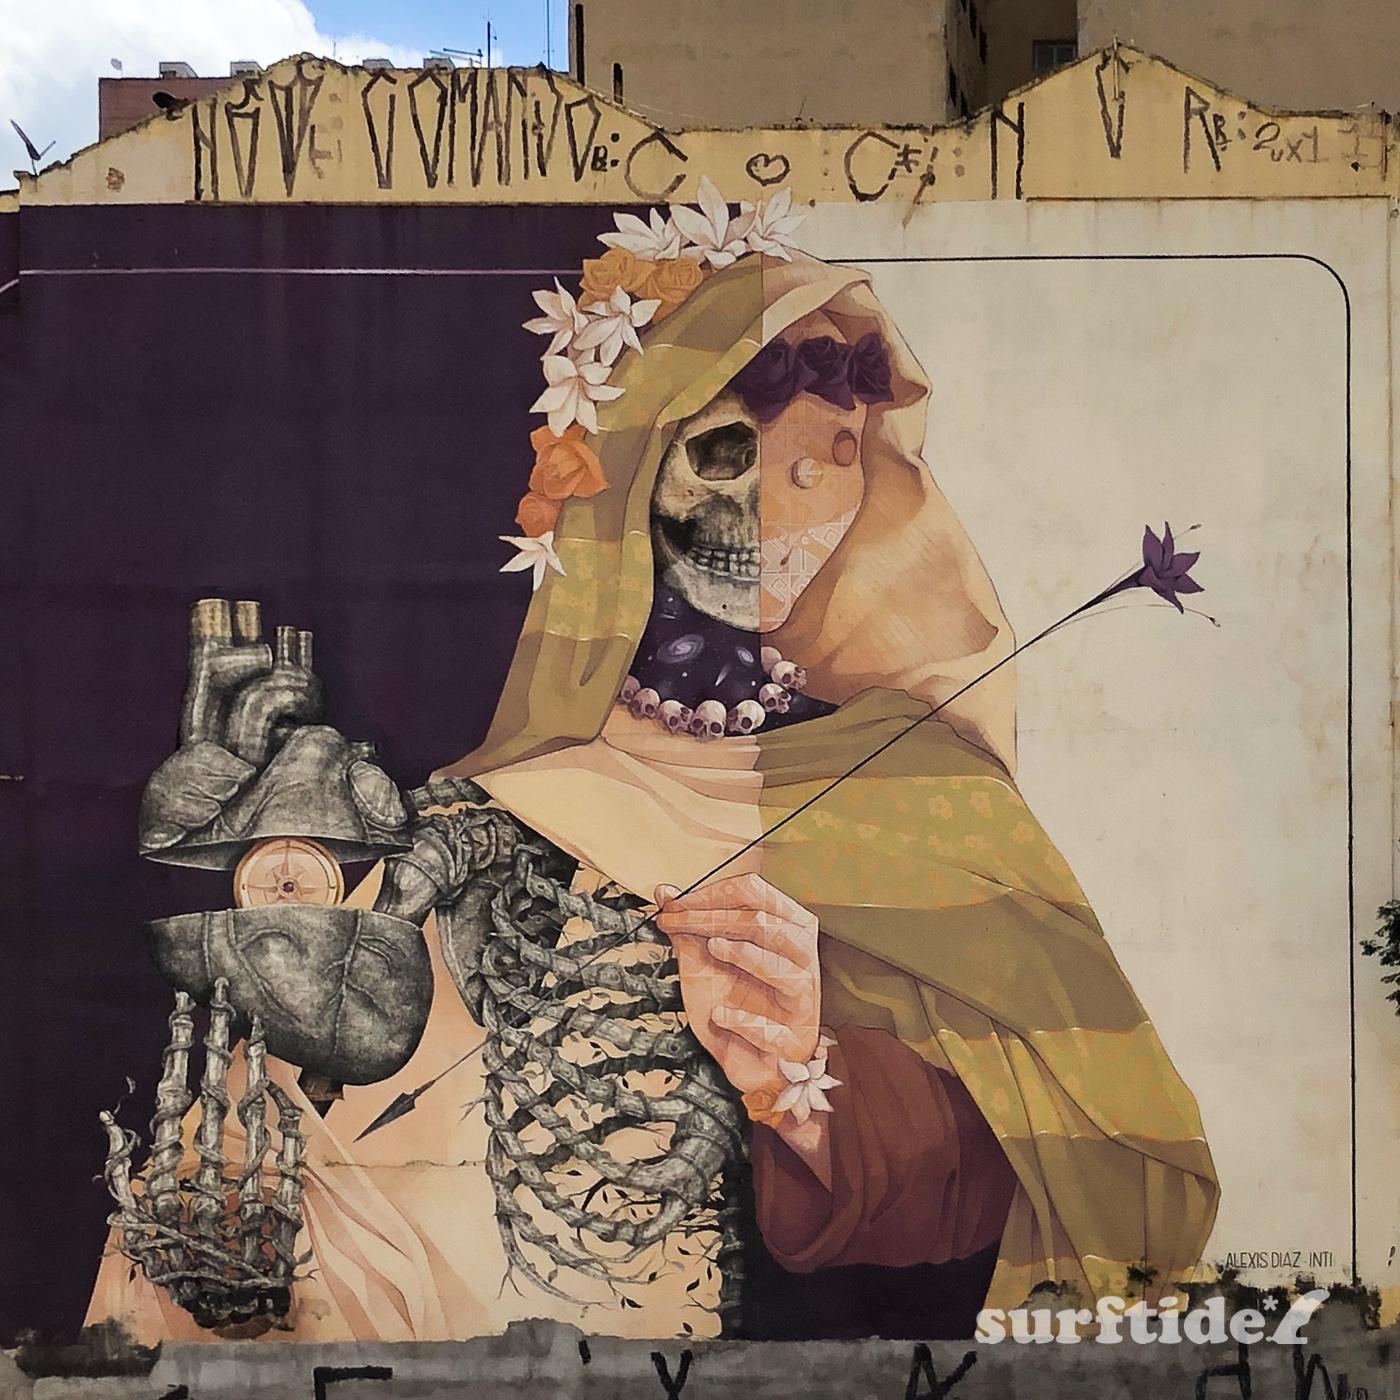 Street Art Collaboration by Alexis Diaz & INTI